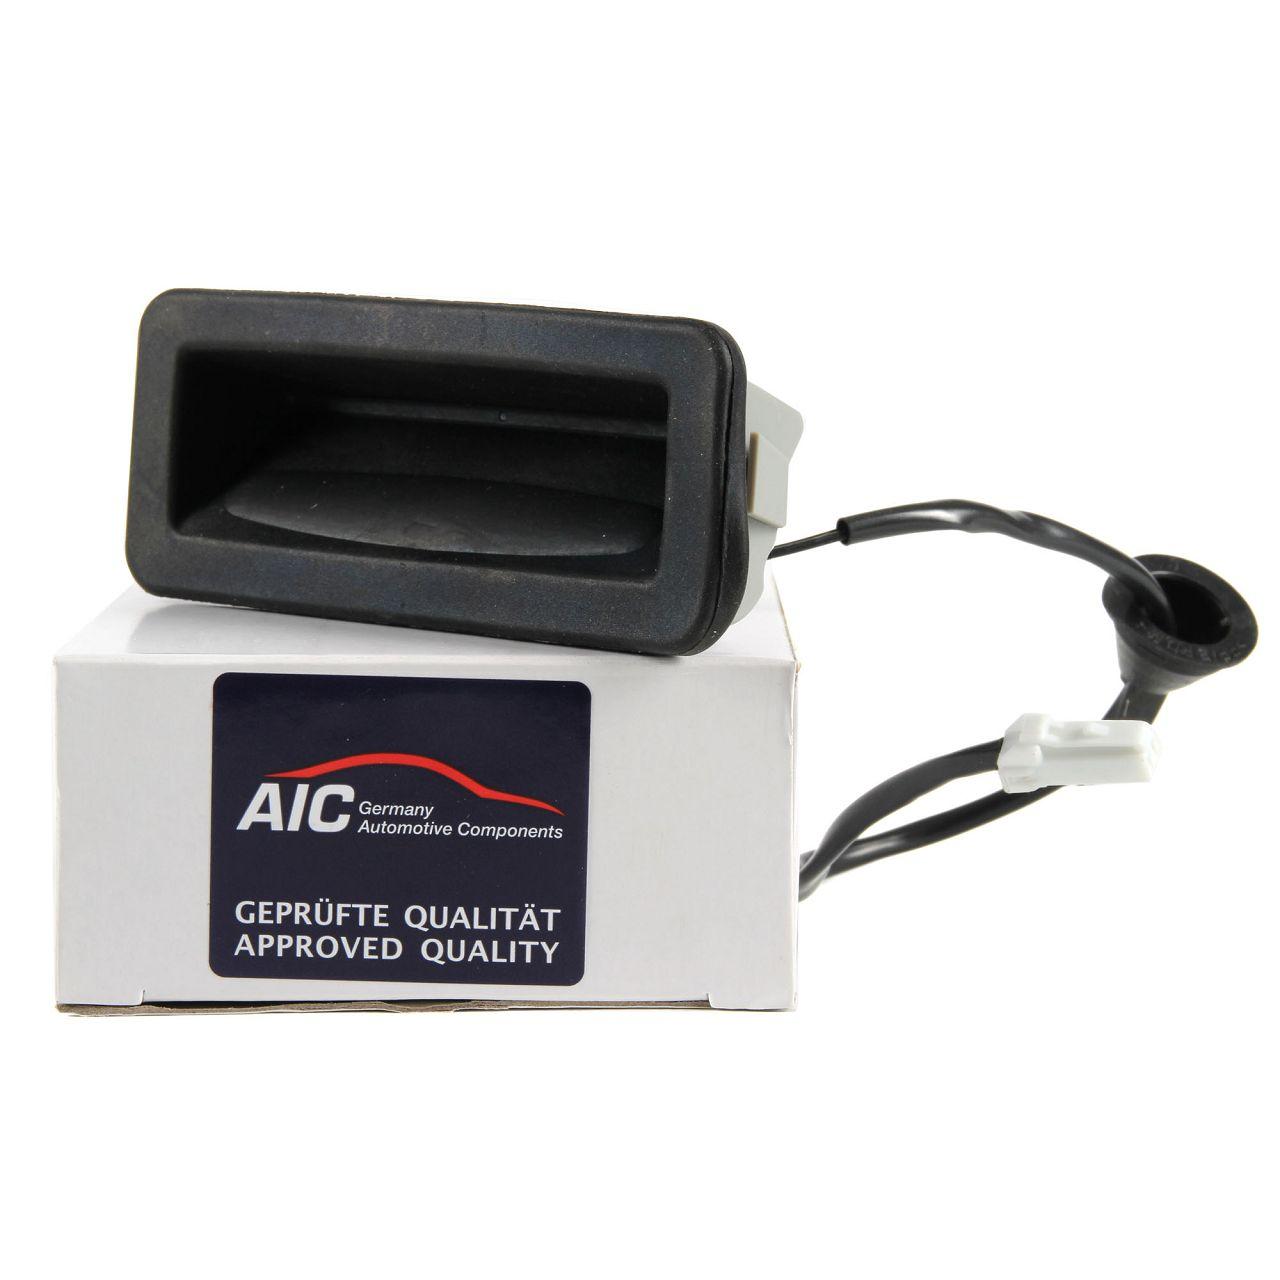 AIC Heckklappengriff Griff Kofferraumklappe für FORD FOCUS C-MAX / FOCUS II MK2